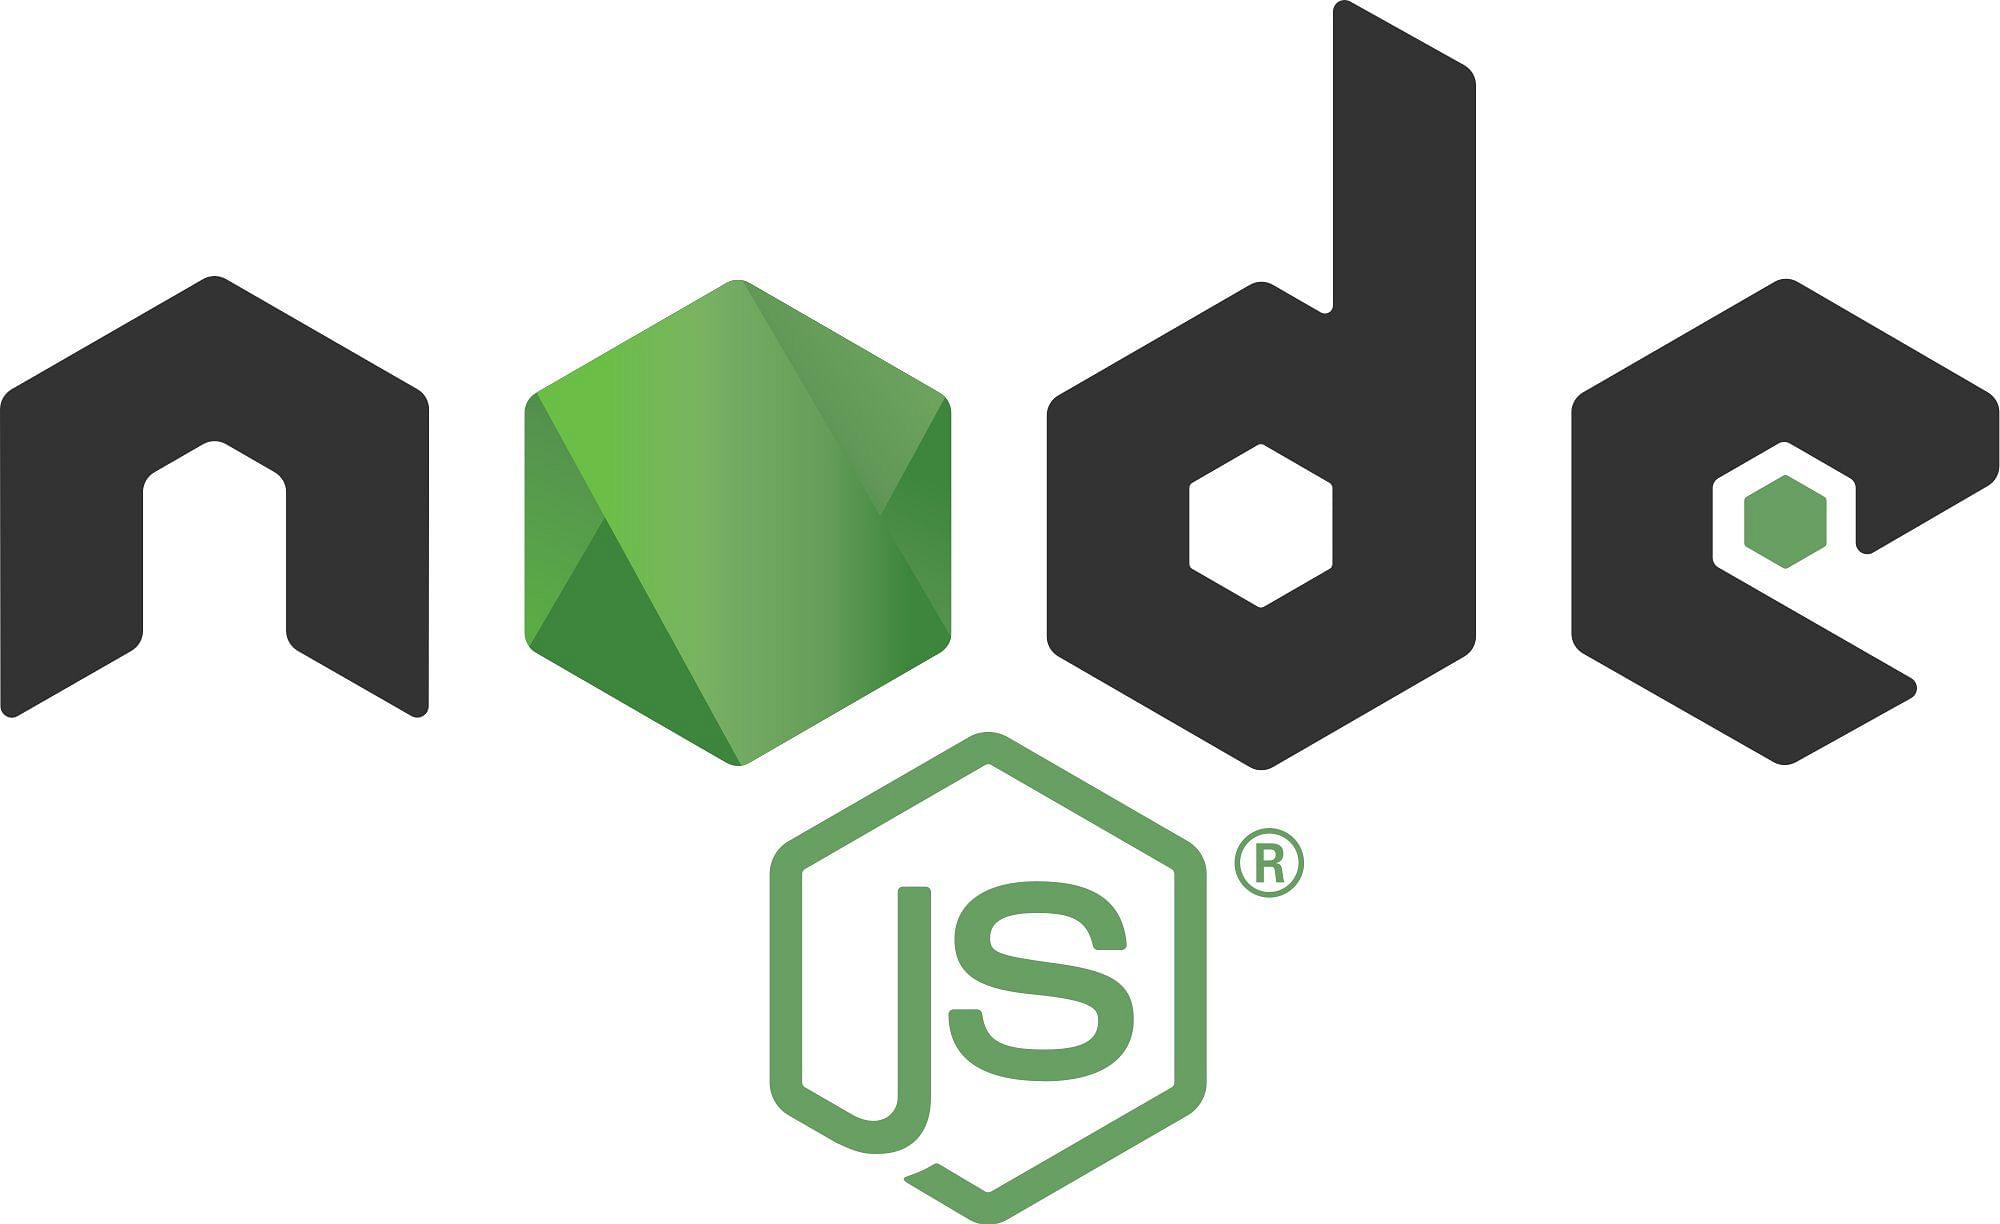 Top 5 Reason Behind Node.js Popularity